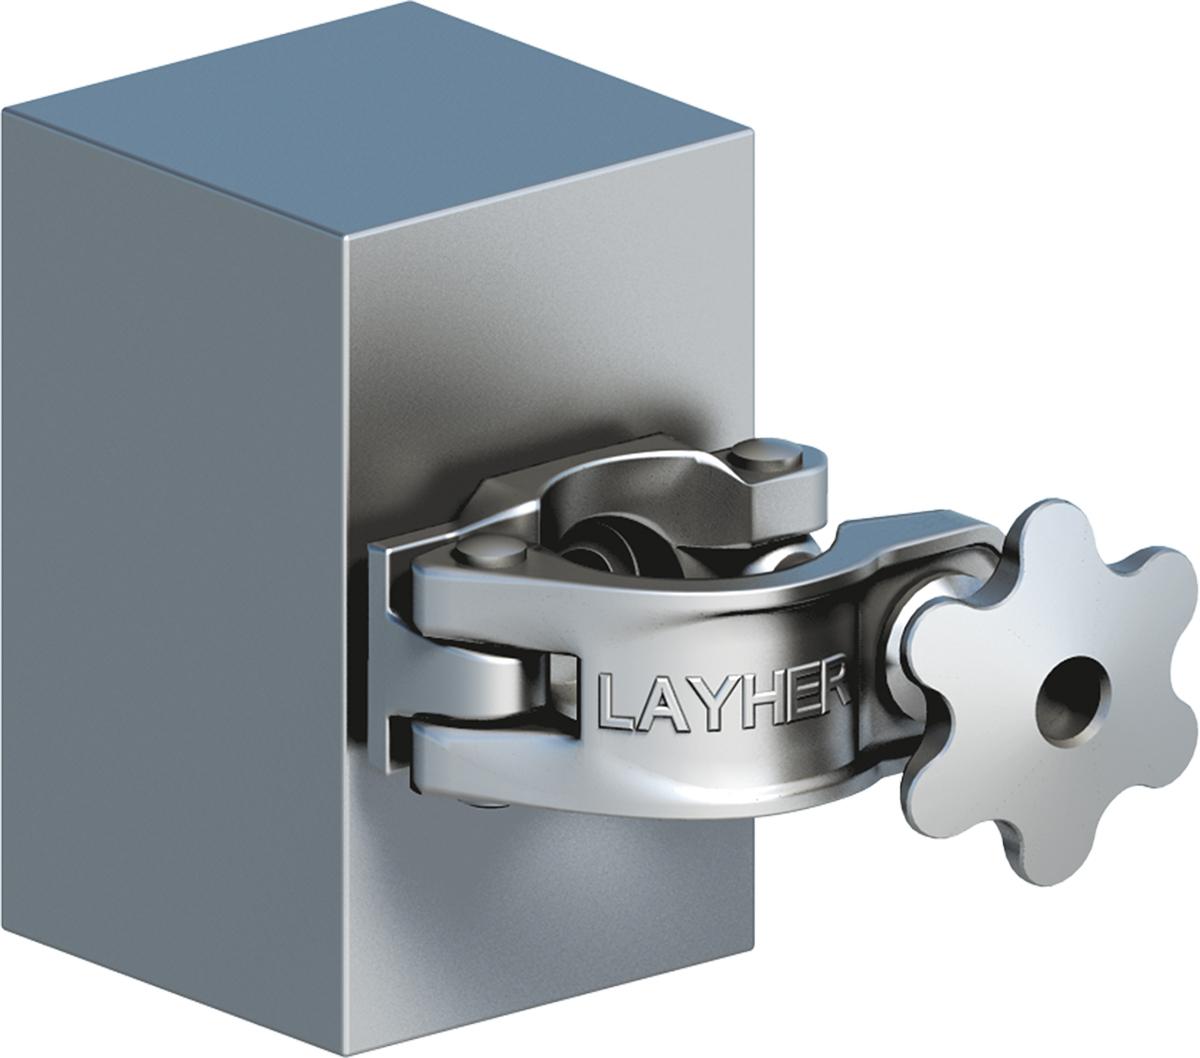 Layher Fahrgerüst Stahl-Ballast 10 kg